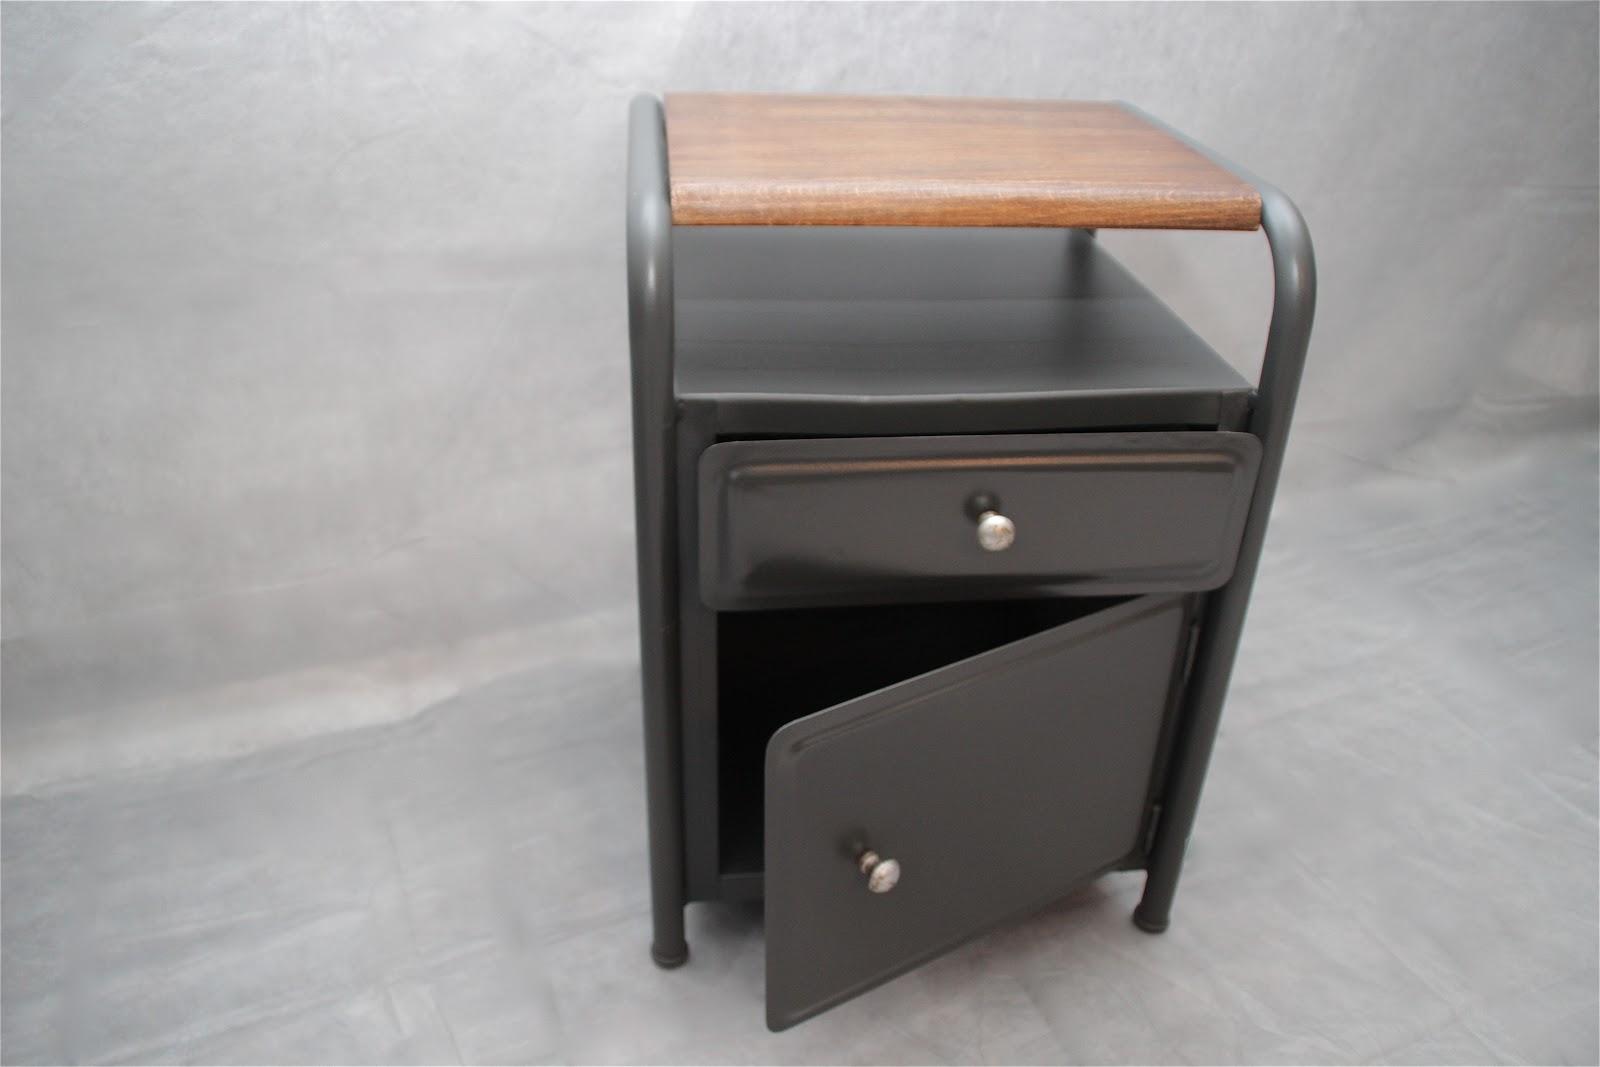 from hell chevet industriel. Black Bedroom Furniture Sets. Home Design Ideas